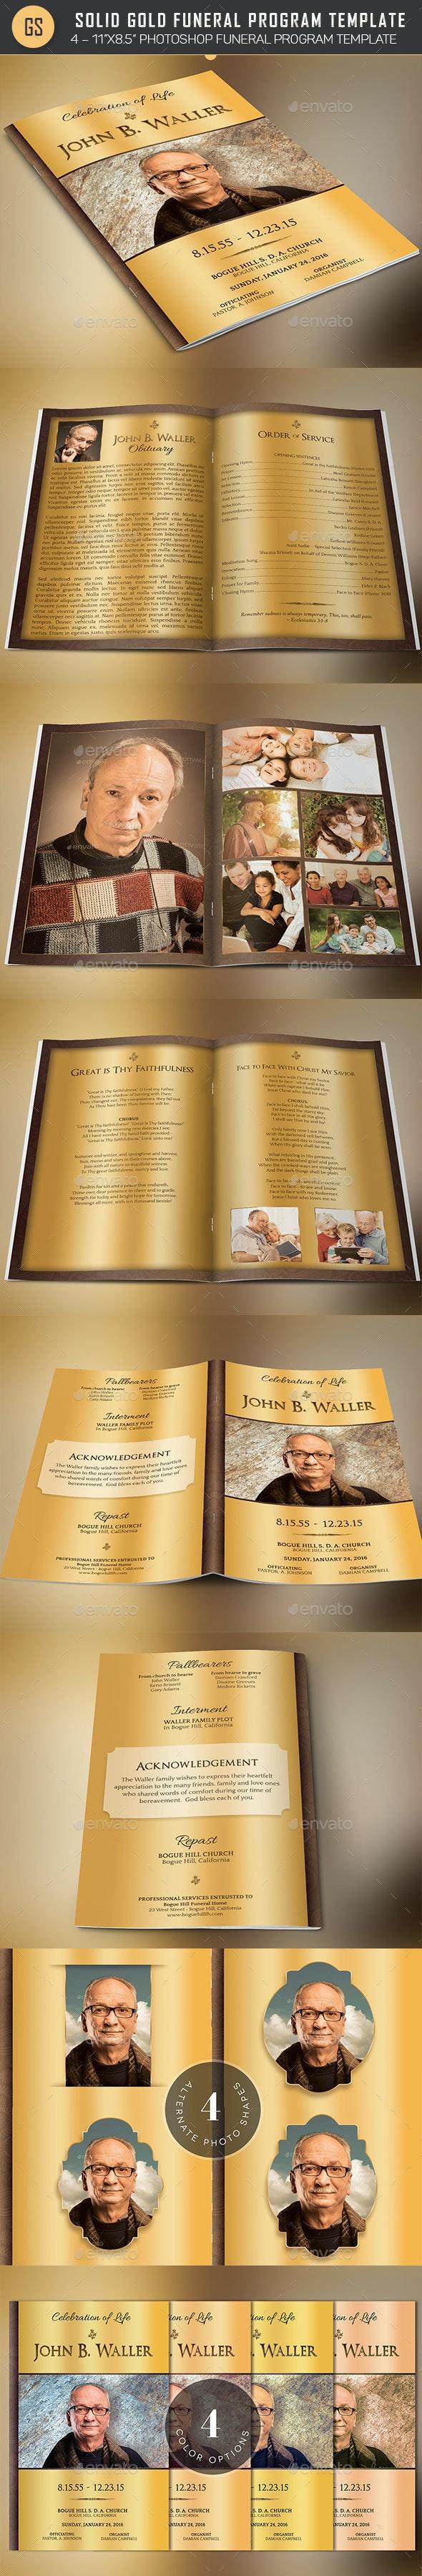 Solid Gold Funeral Program Template - Informational Brochures